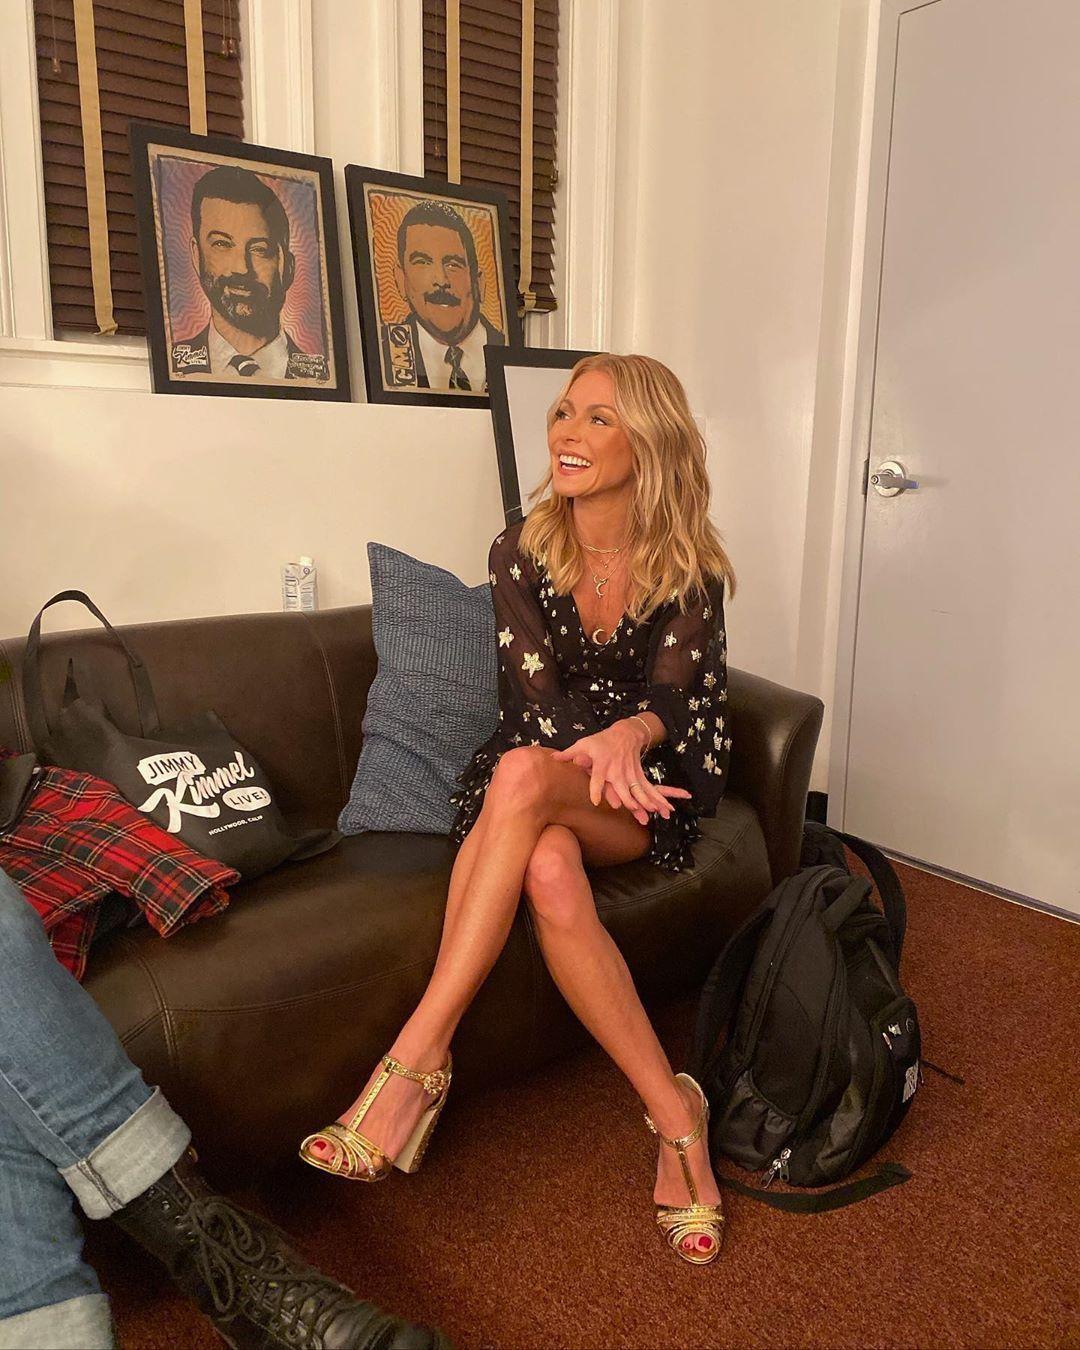 Kelly Ripa leggy and seated